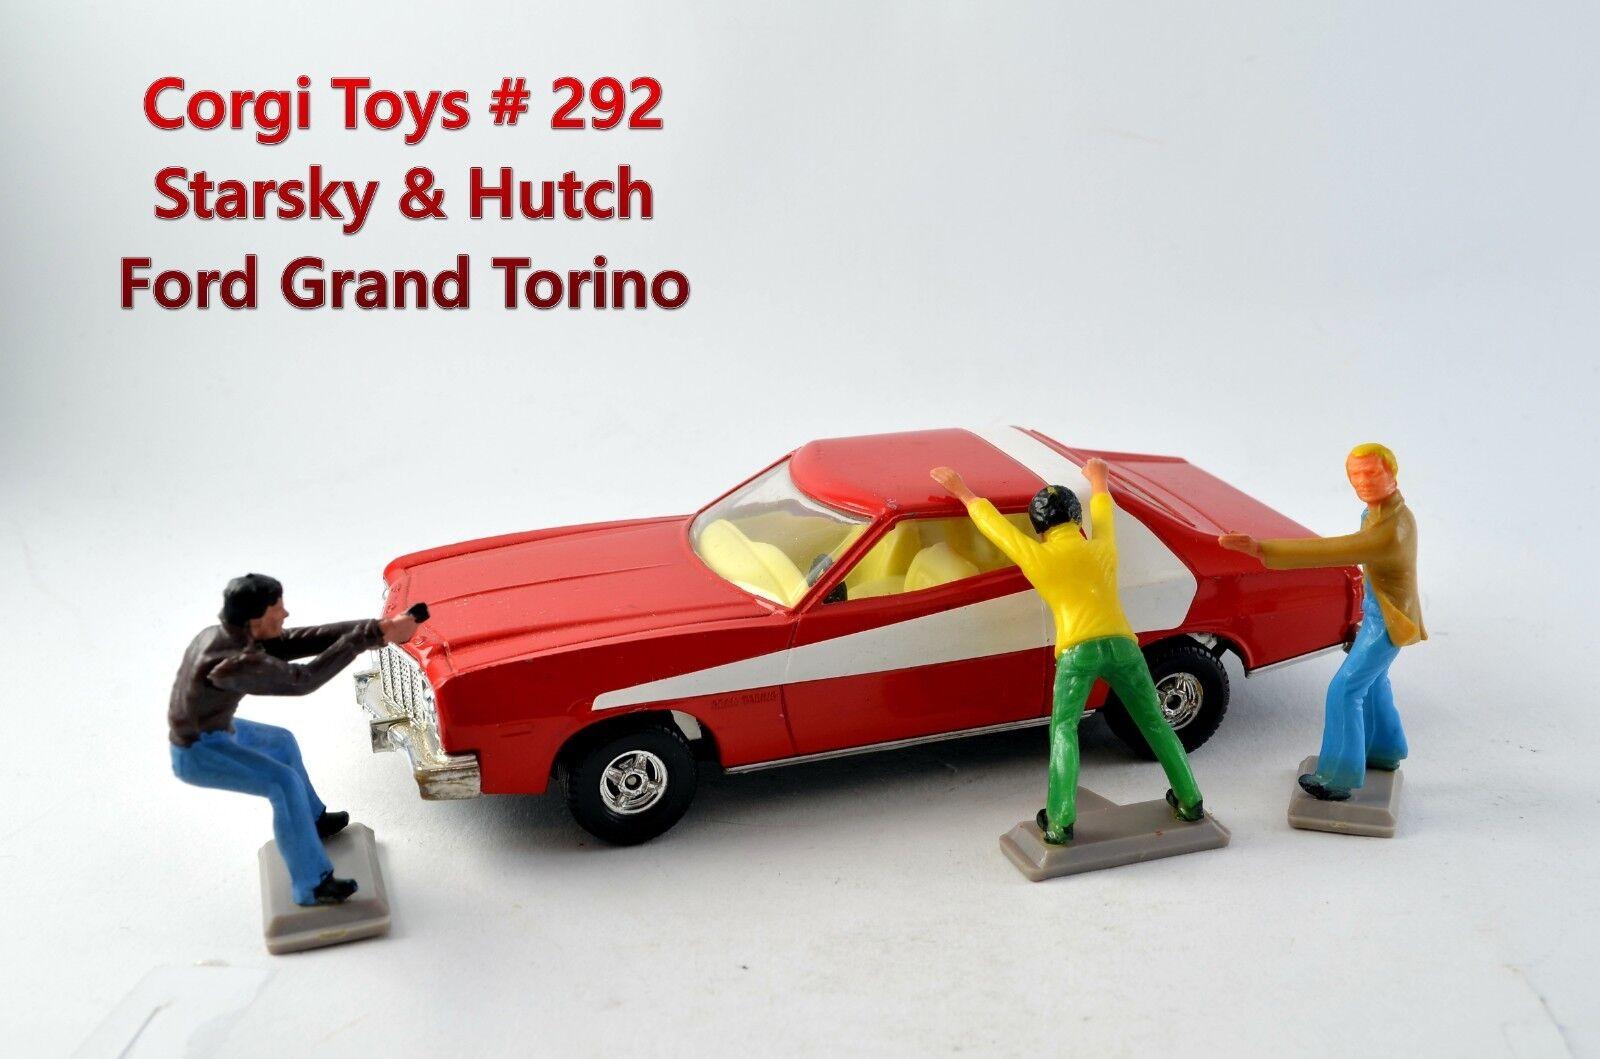 Corgi Toys;   292; Starsky & Hutch Ford Grand Torino inkl. Figures